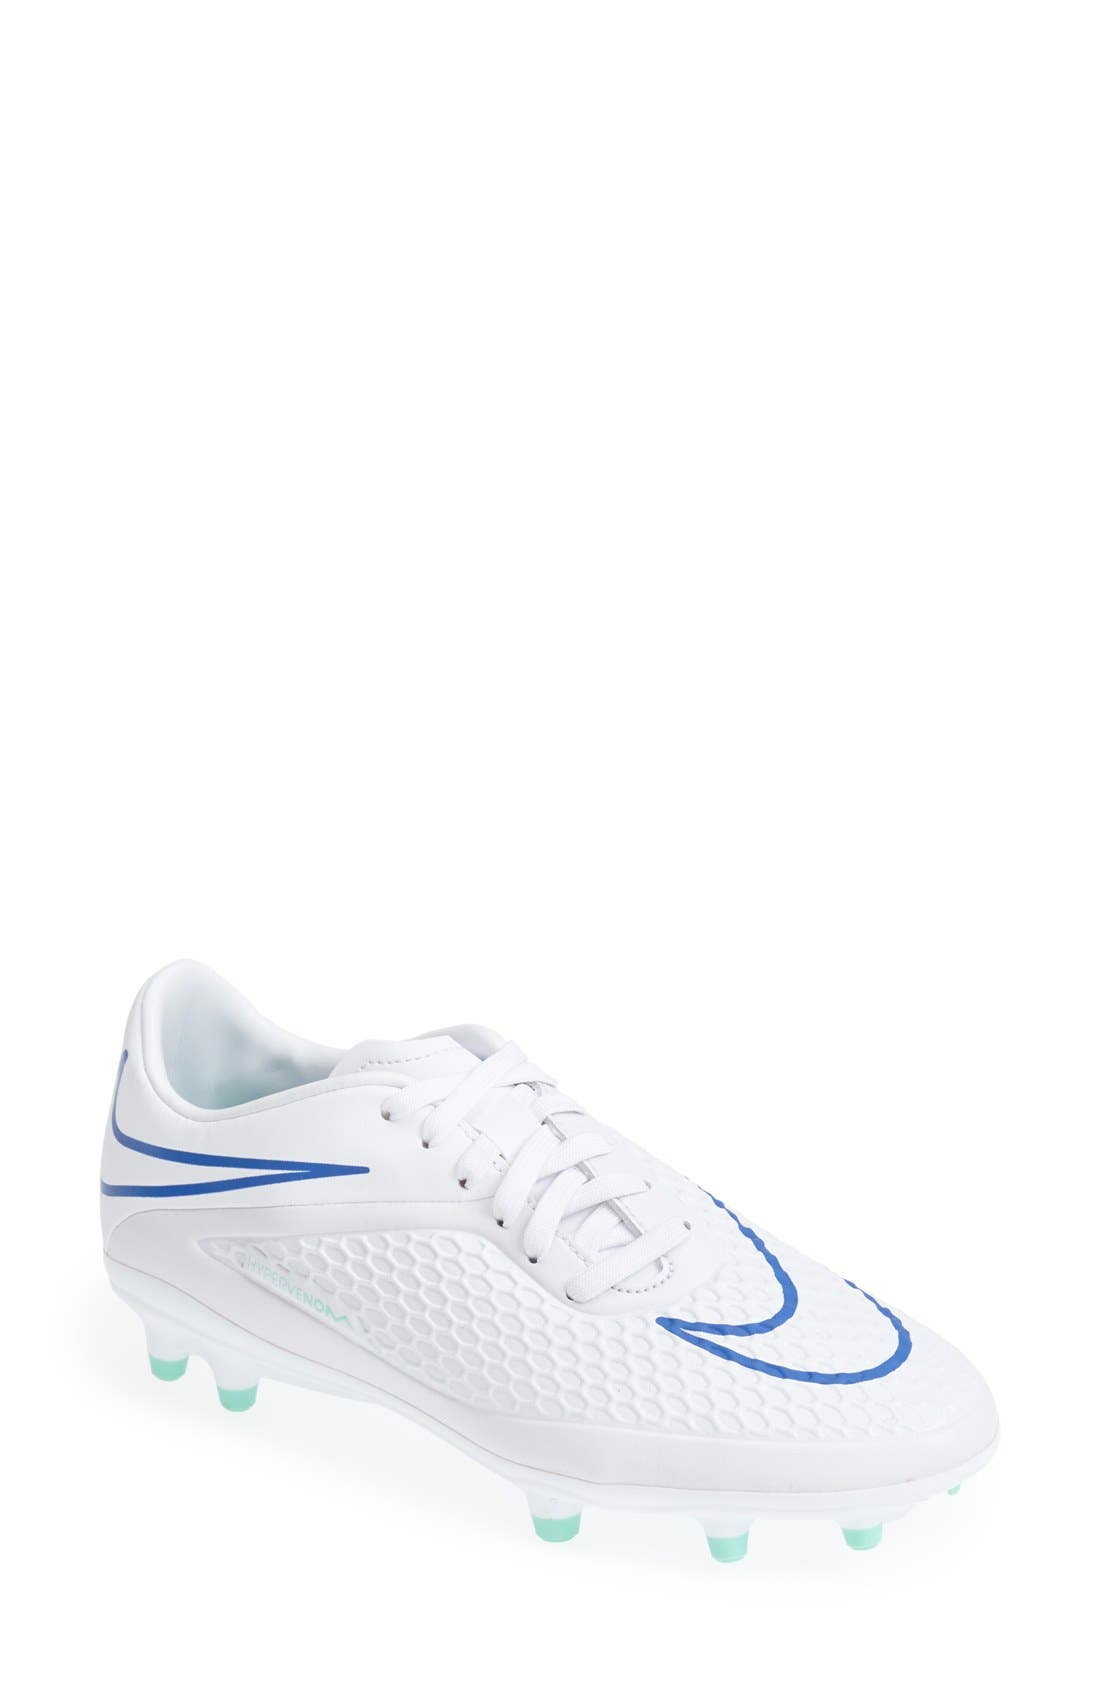 Main Image - Nike 'Hypervenom Phelon' Firm Ground Soccer Cleat (Women)